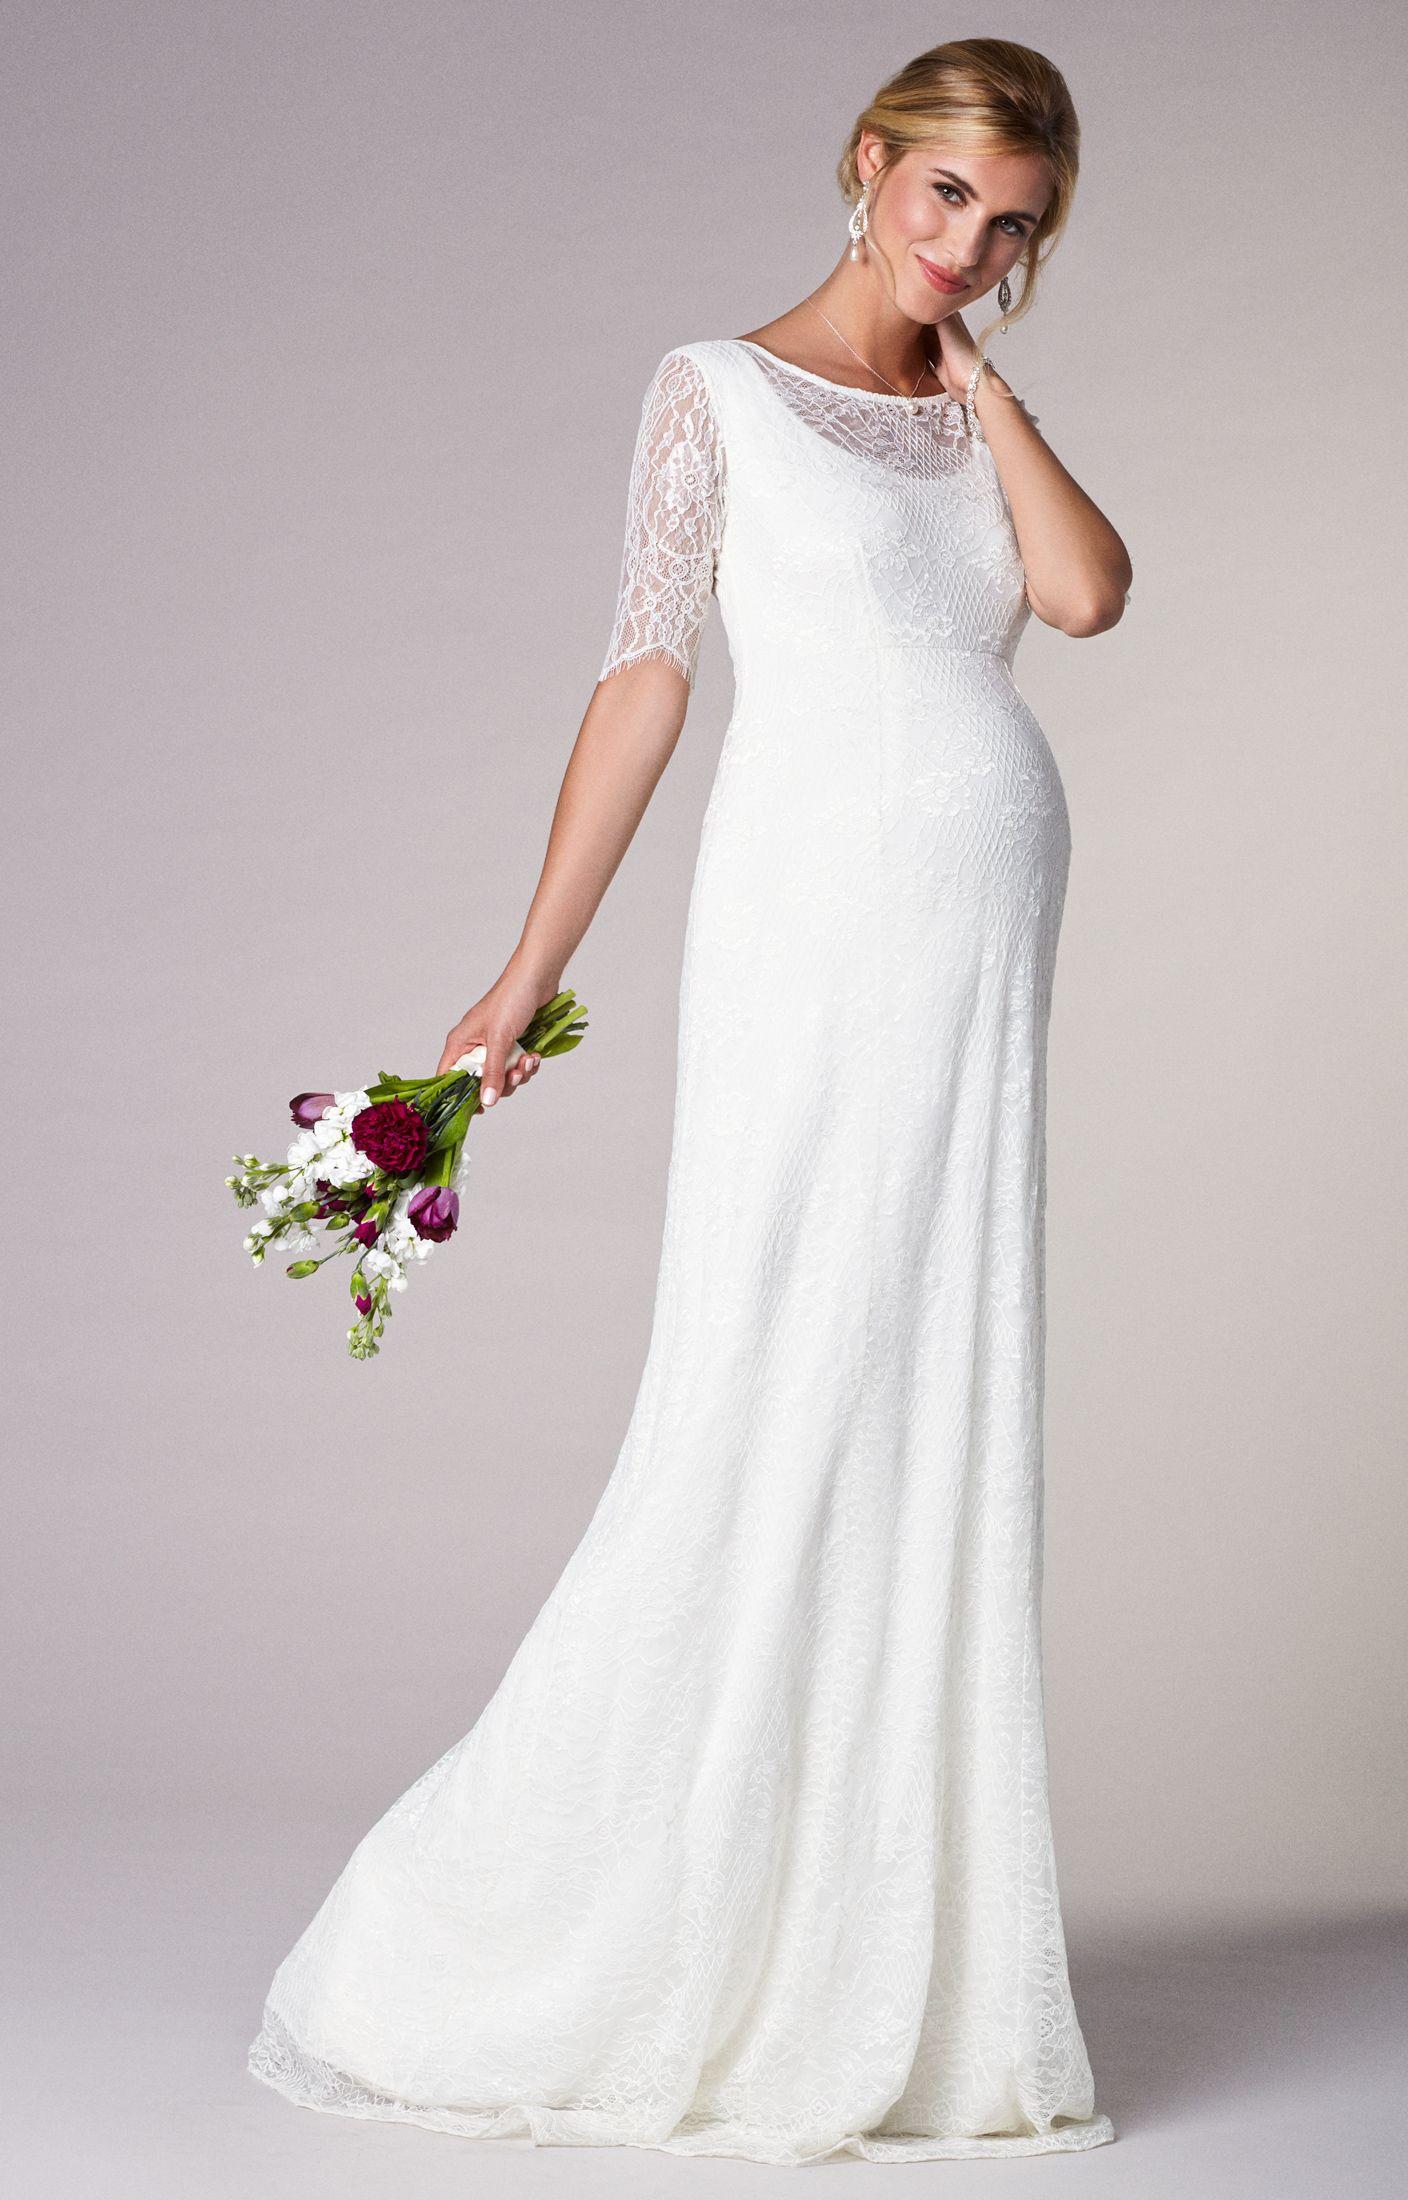 0c8cc17263c90 Evie Lace Gown | maternity options | Pregnant wedding dress ...